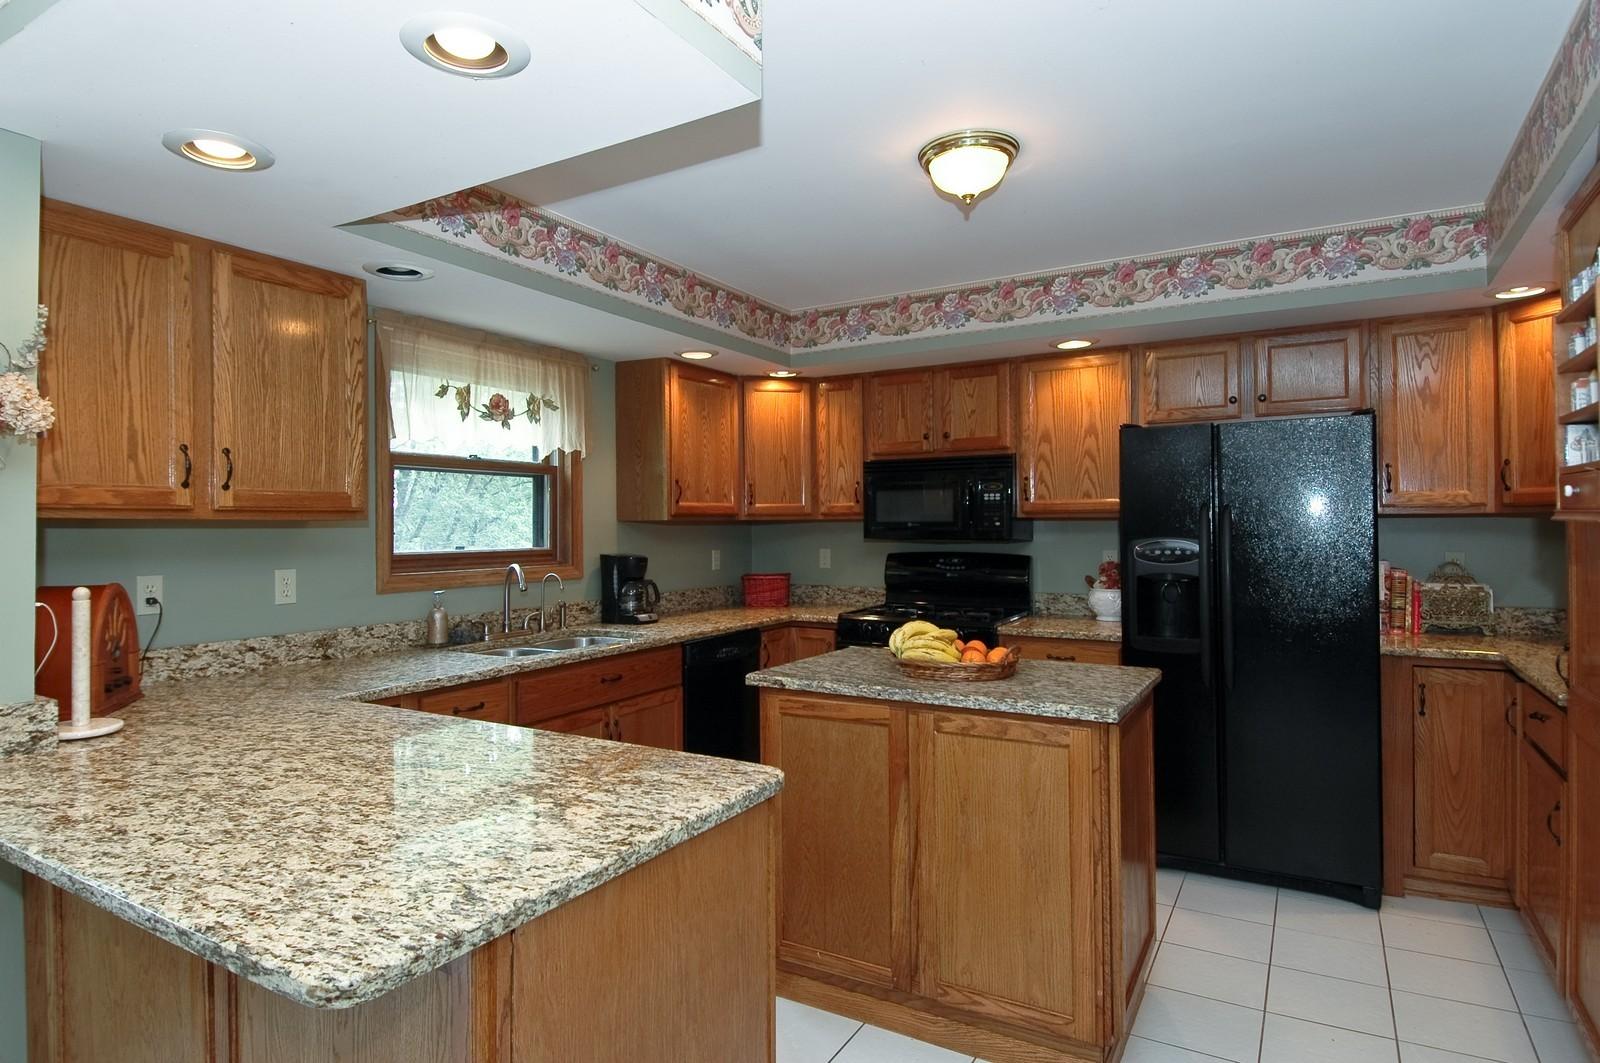 Real Estate Photography - 6106 S Kilkenny, Crystal Lake, IL, 60014 - Kitchen